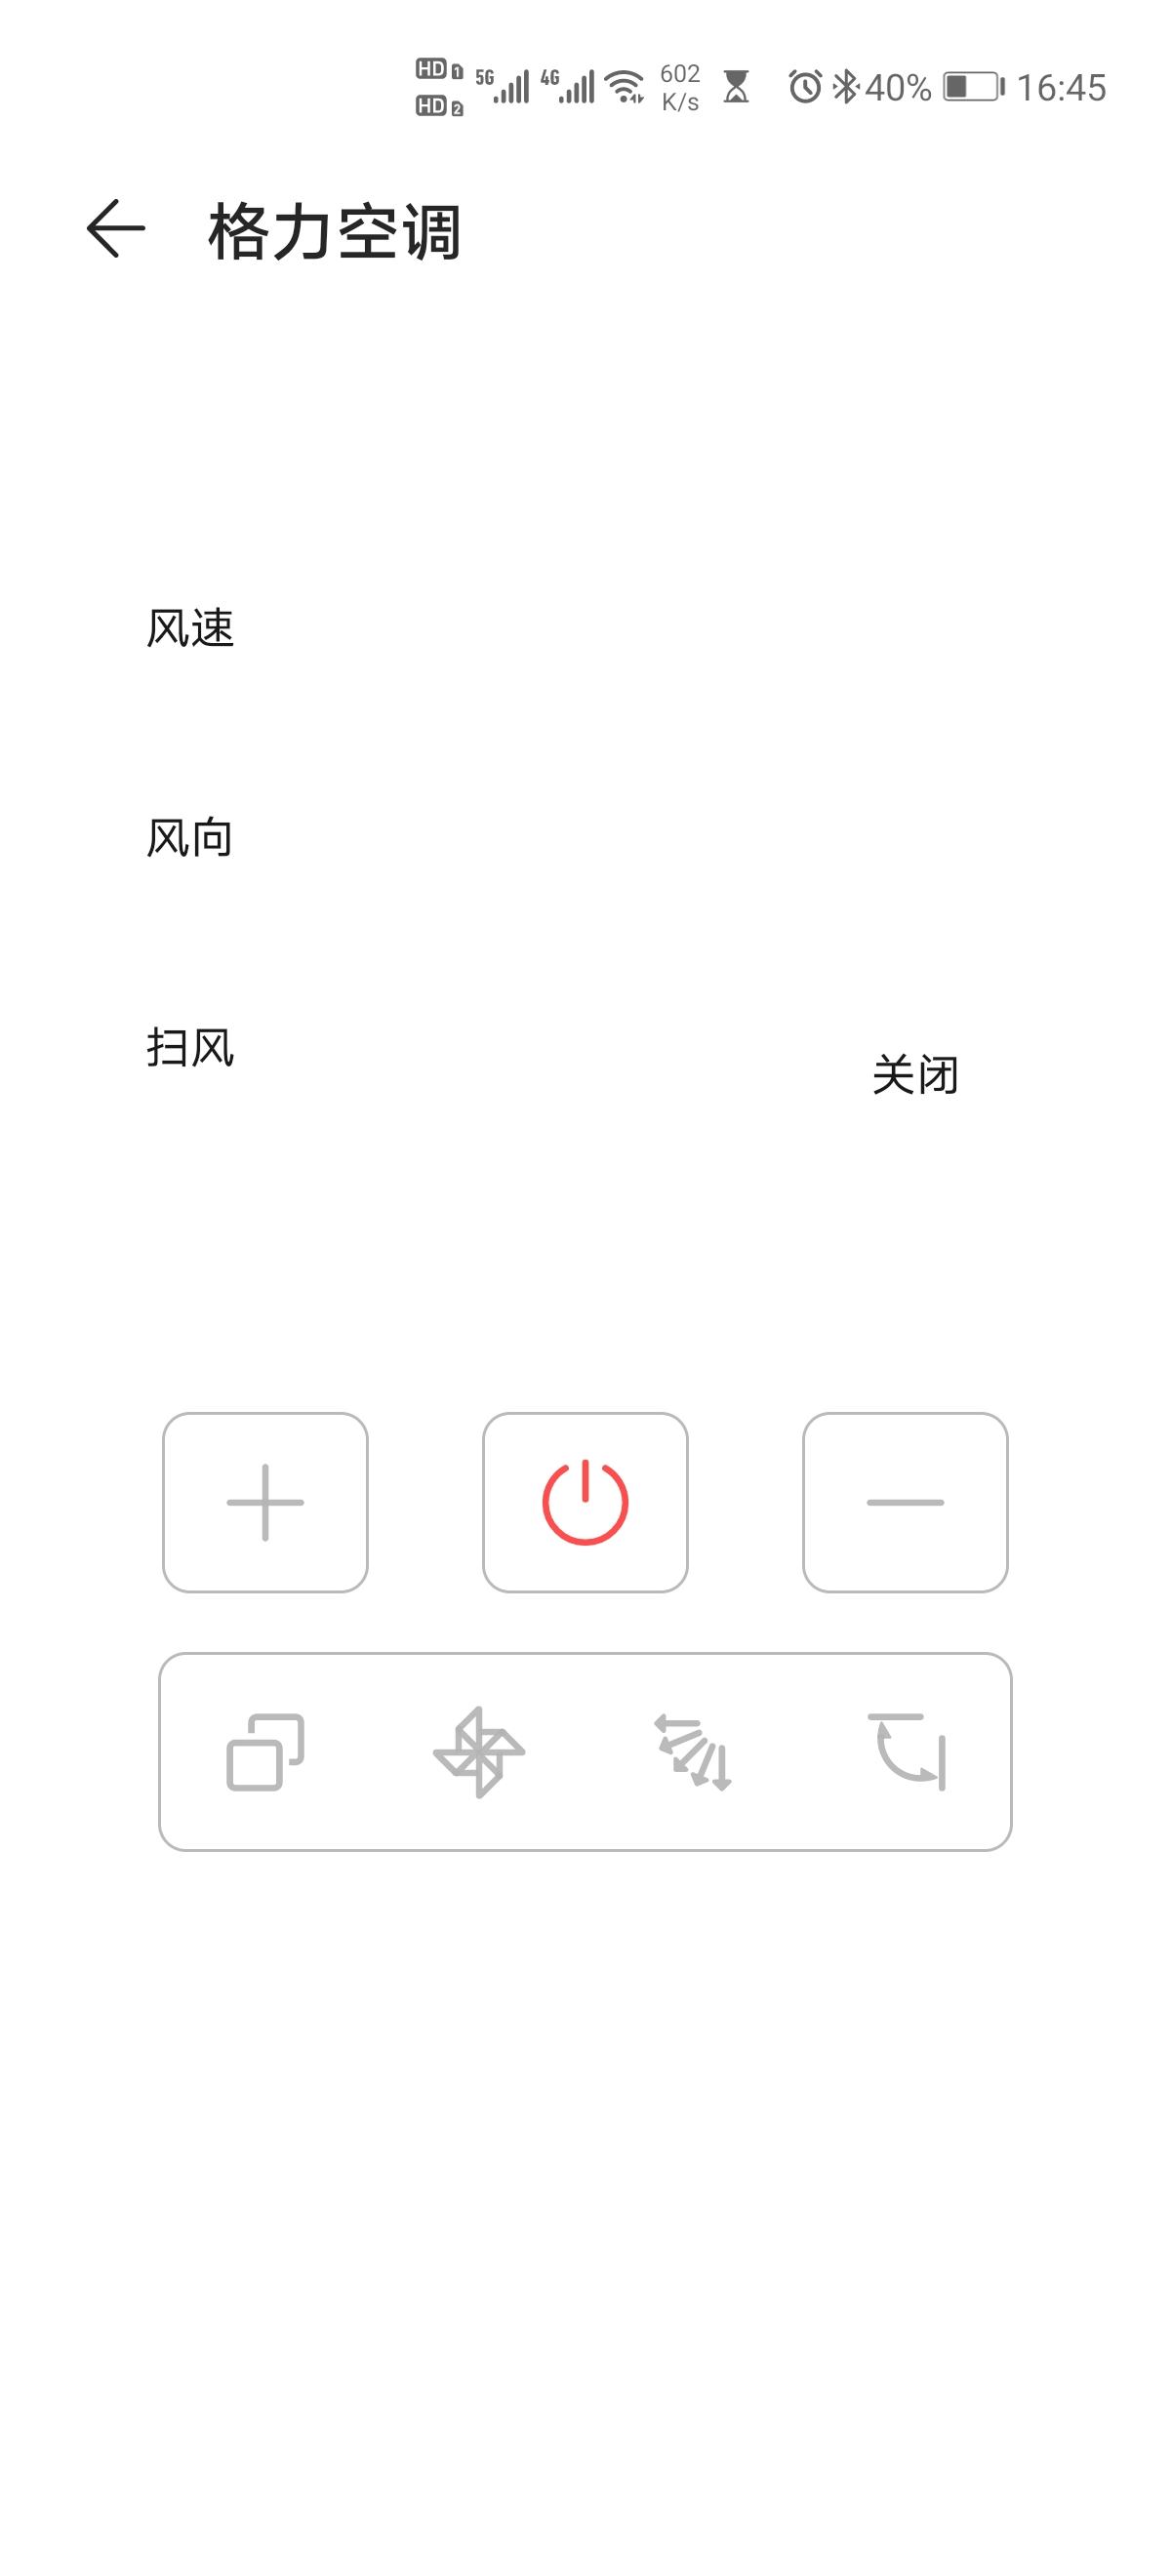 Screenshot_20200509_164550_com.huawei.android.remotecontroller.jpg